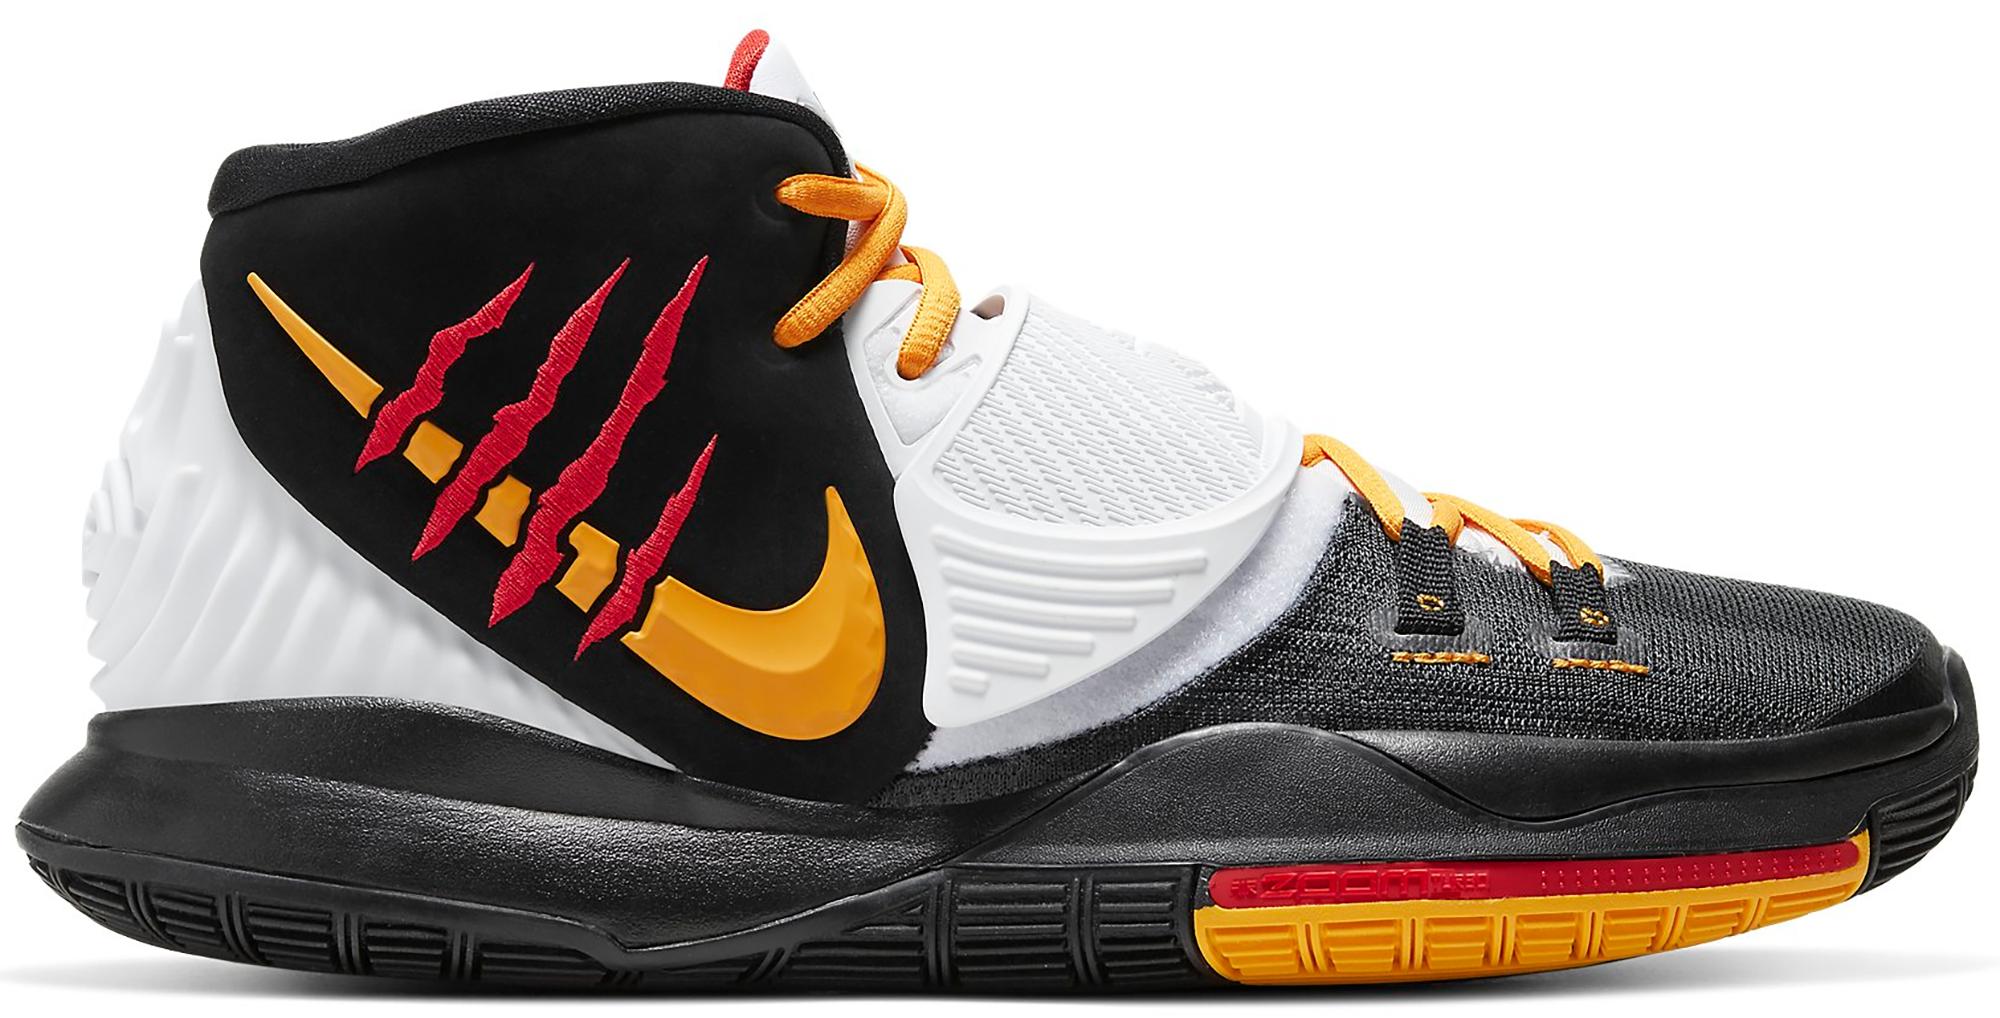 Nike Kyrie 6 Bruce Lee Black - CJ1290-001